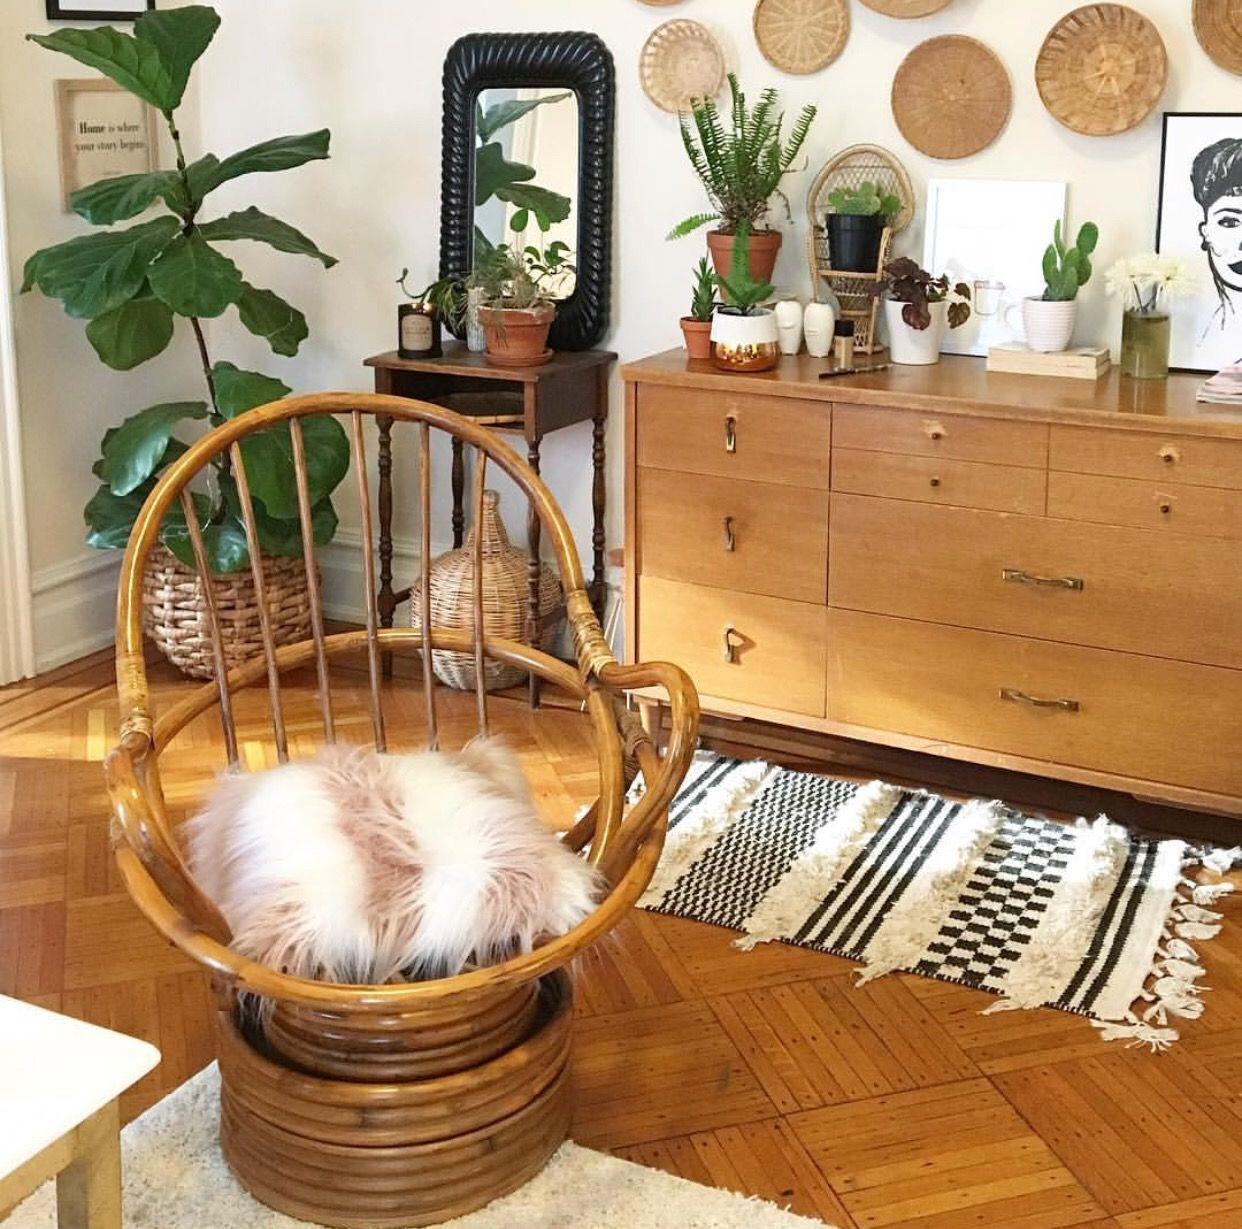 Best Bohemian Decor Living Room Boho Chair Wicker Basket Wall Decor Plants Black And White Boho 400 x 300